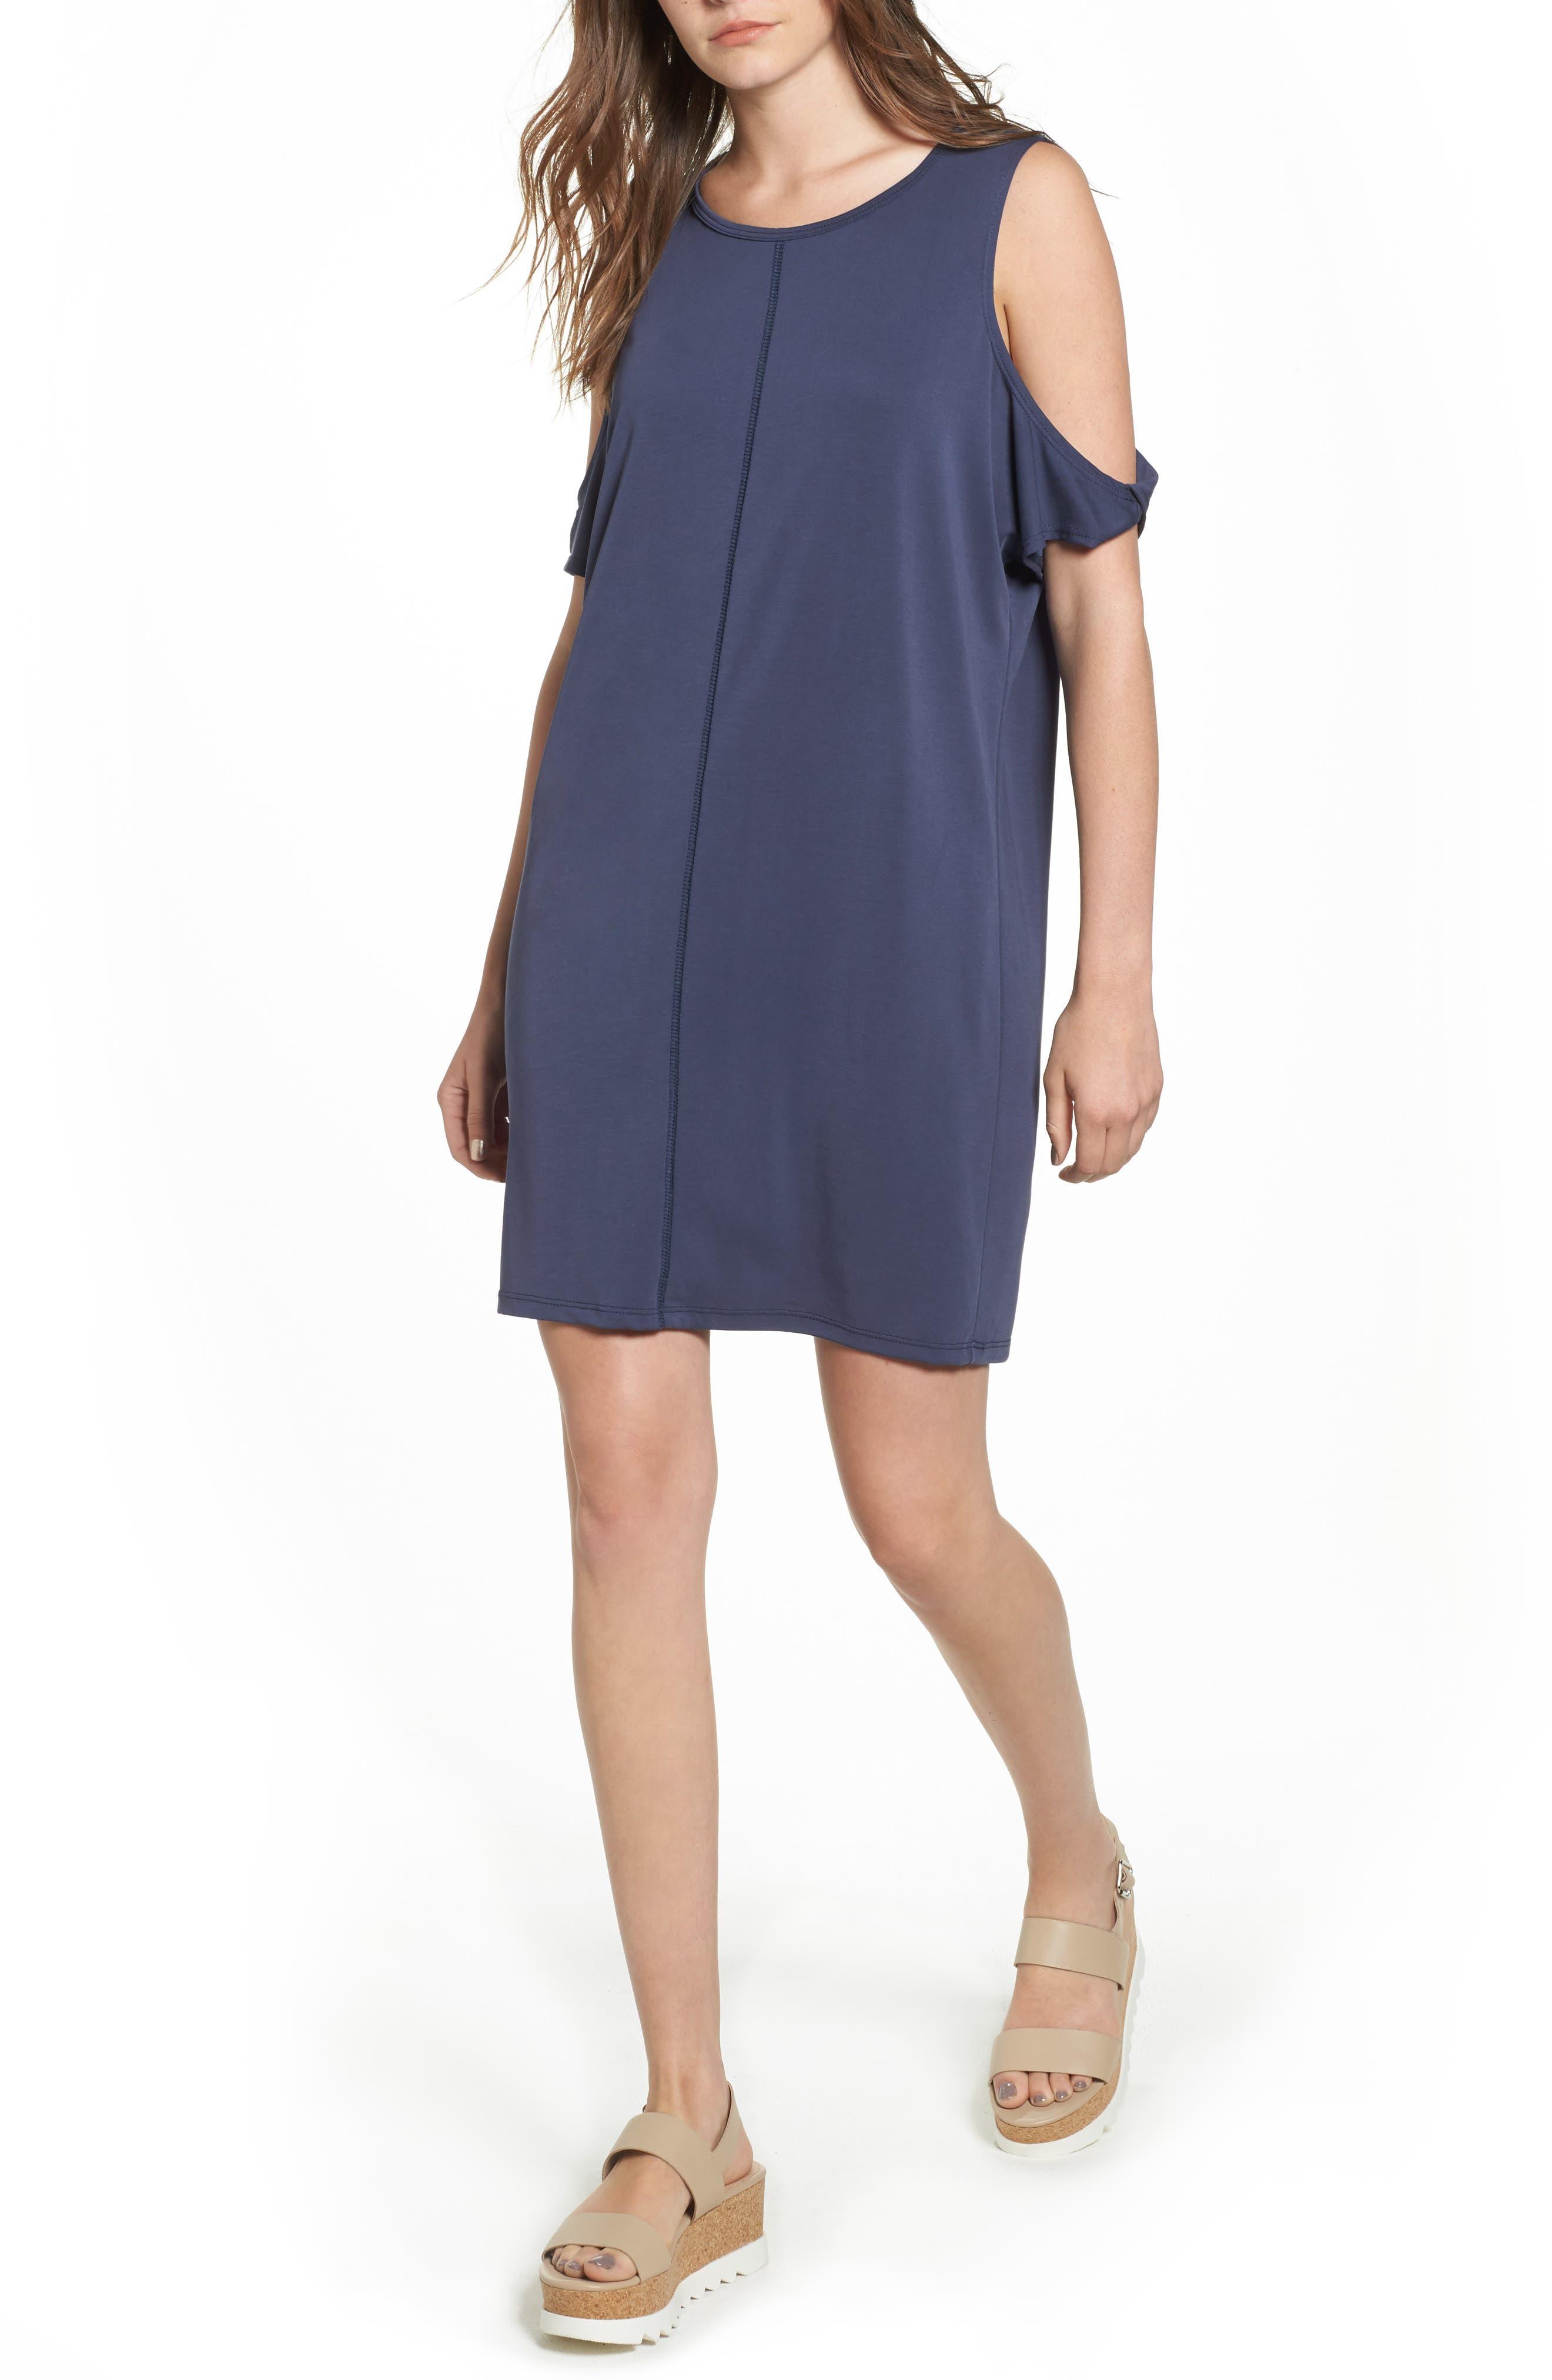 Twisted Cold Shoulder Dress,                             Main thumbnail 1, color,                             Denim Navy